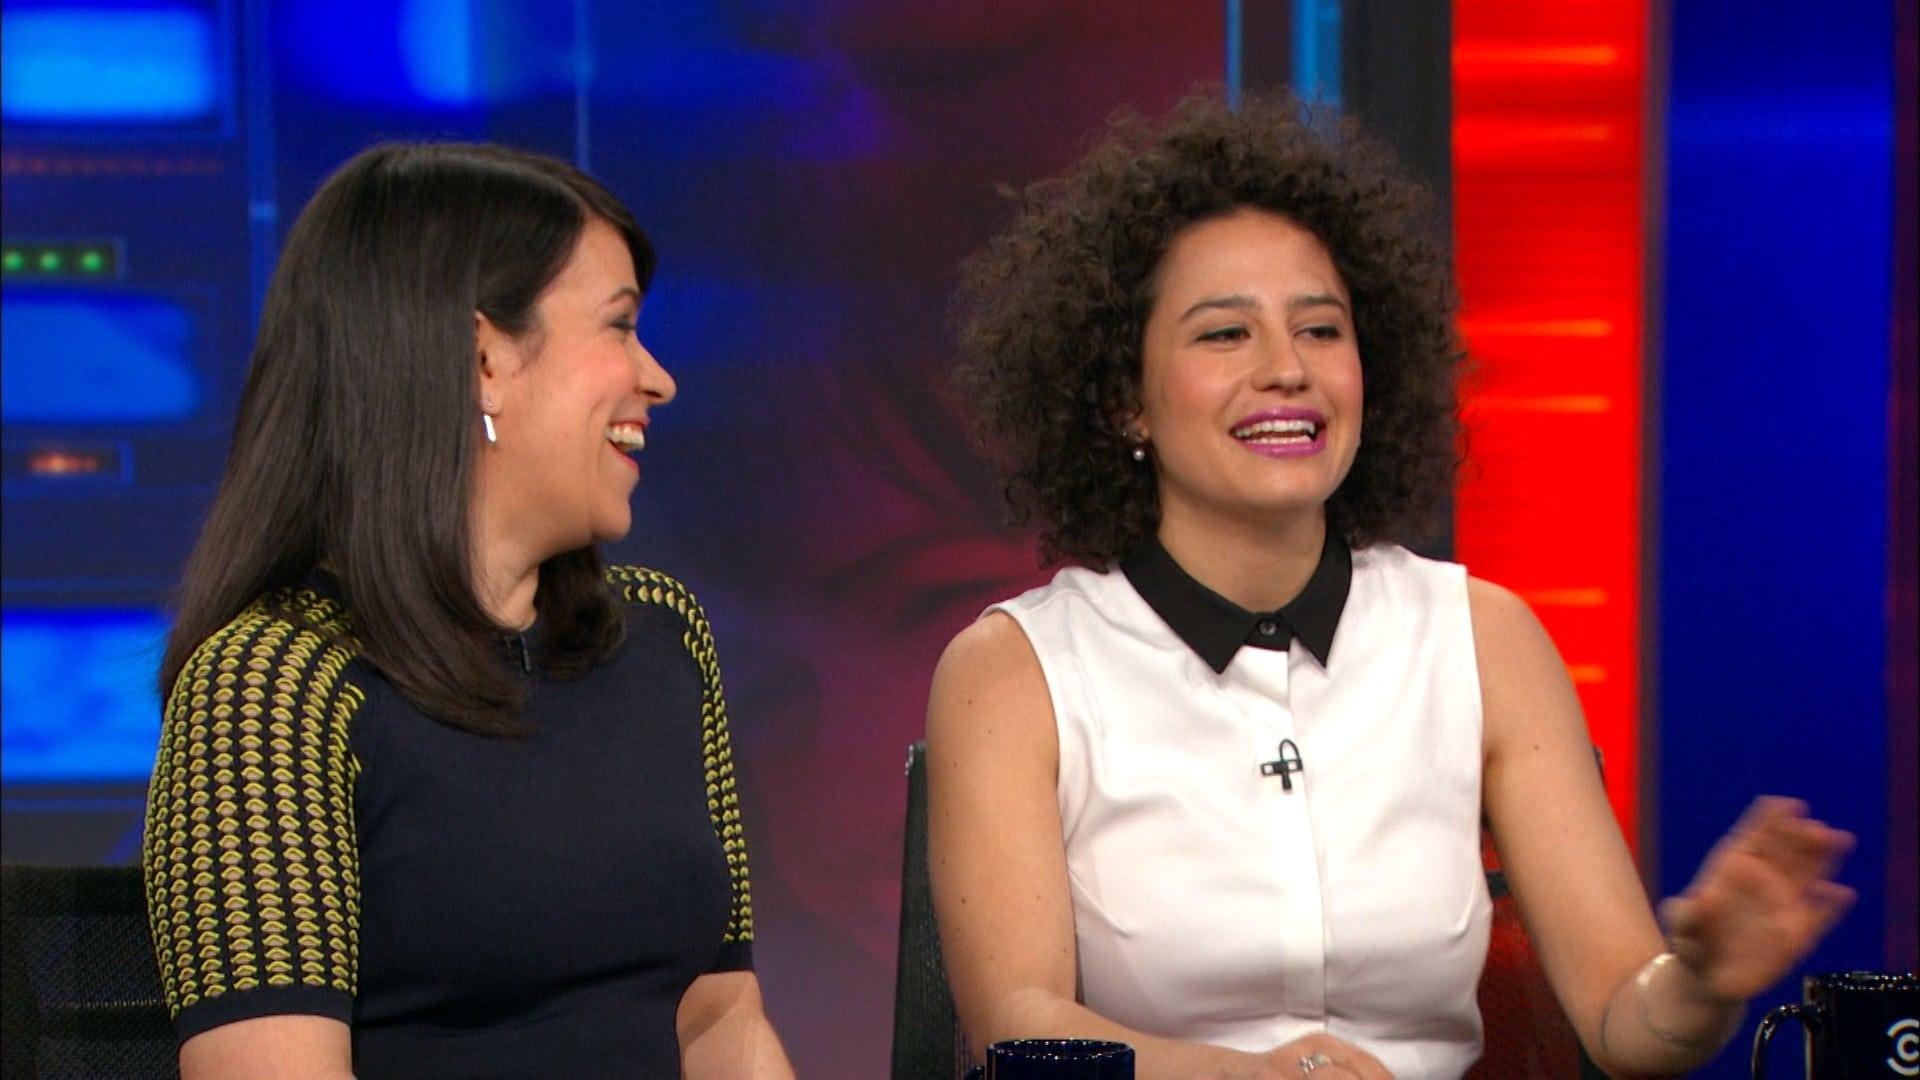 The Daily Show with Trevor Noah Season 20 :Episode 73  Abbi Jacobson & Ilana Glazer